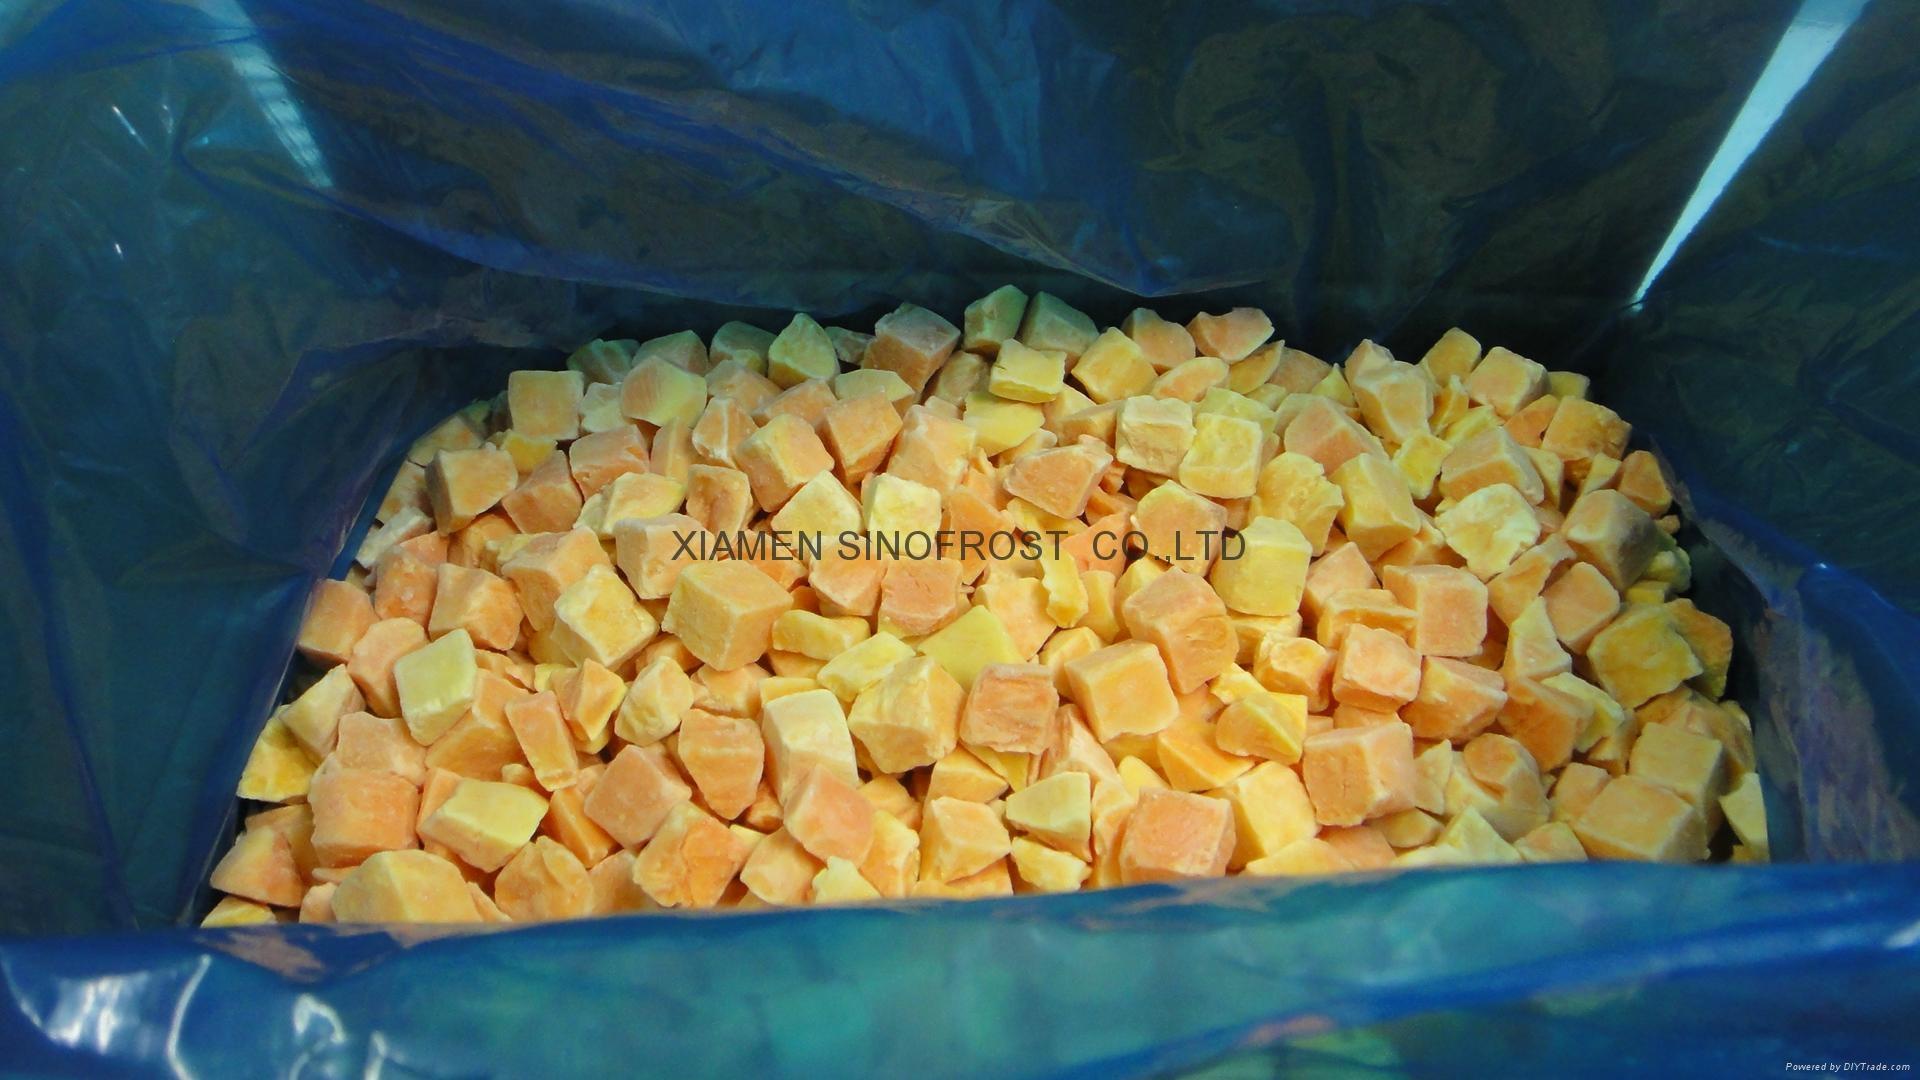 IQF Sweet Potato Dices,Frozen Sweet Potato Dices,IQF Cut Sweet Potato 11